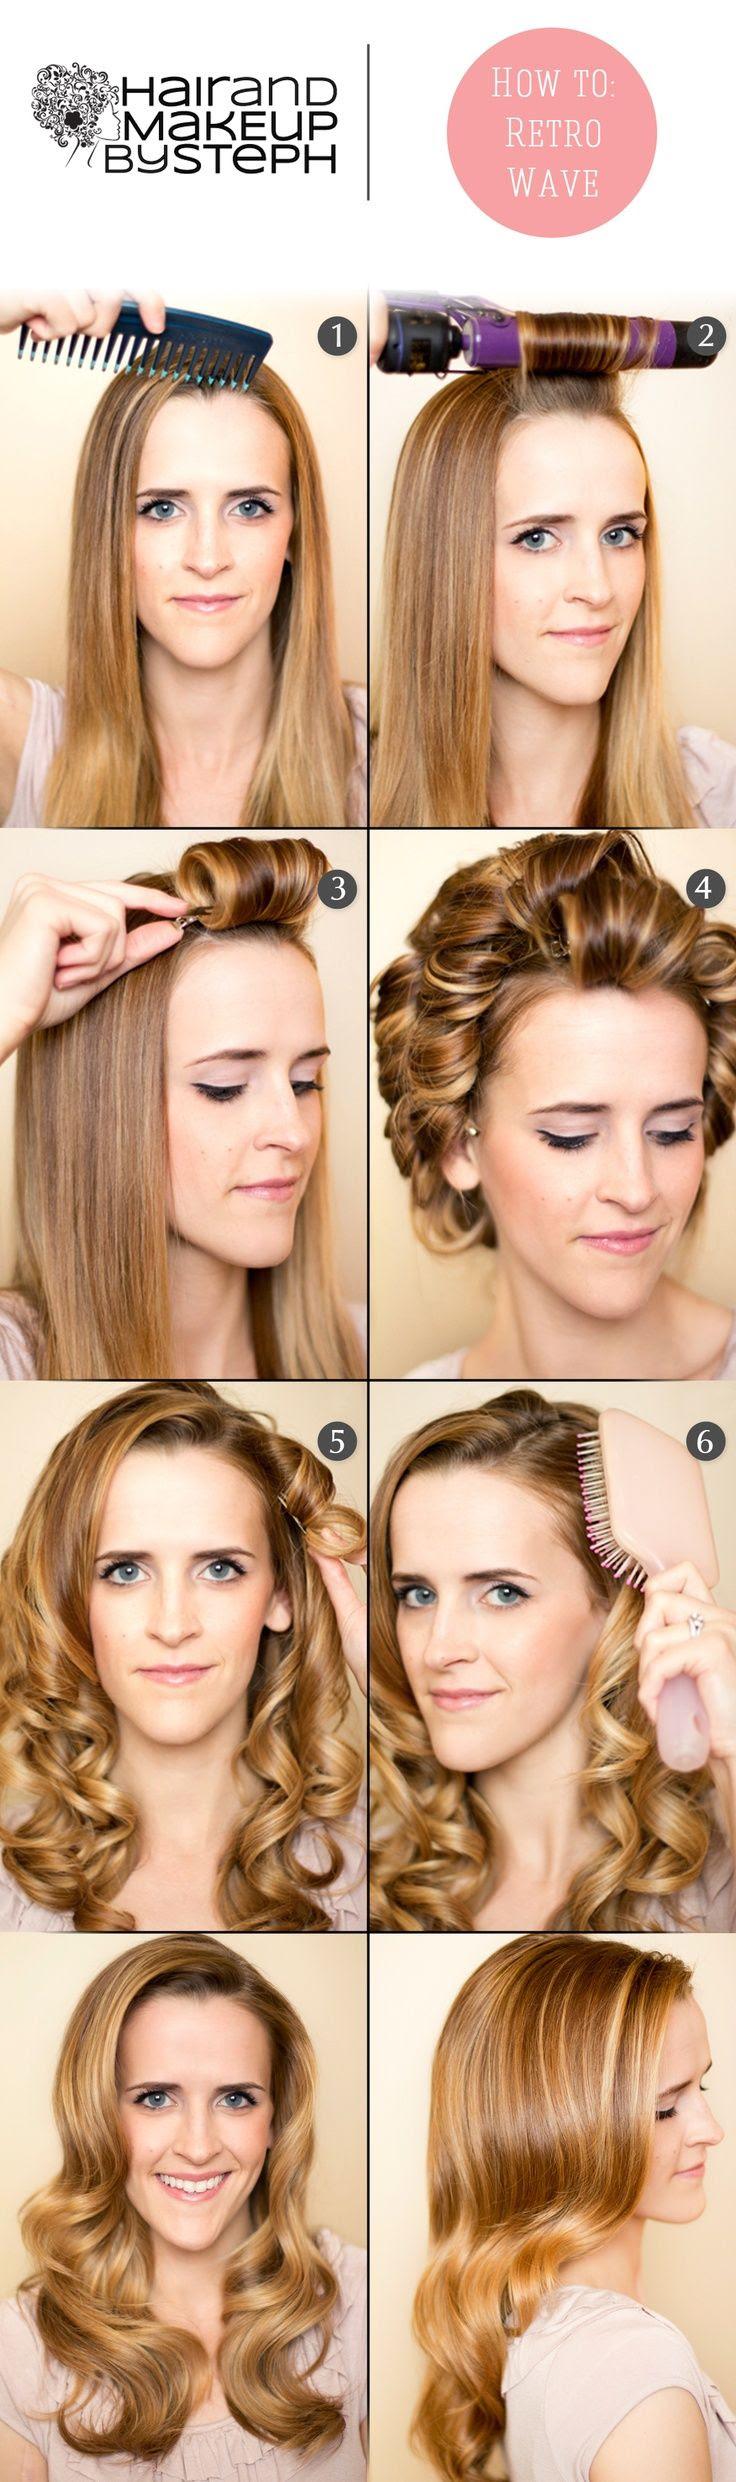 20 Stylish Retro Wavy Hairstyle Tutorials And Hair Looks Pretty